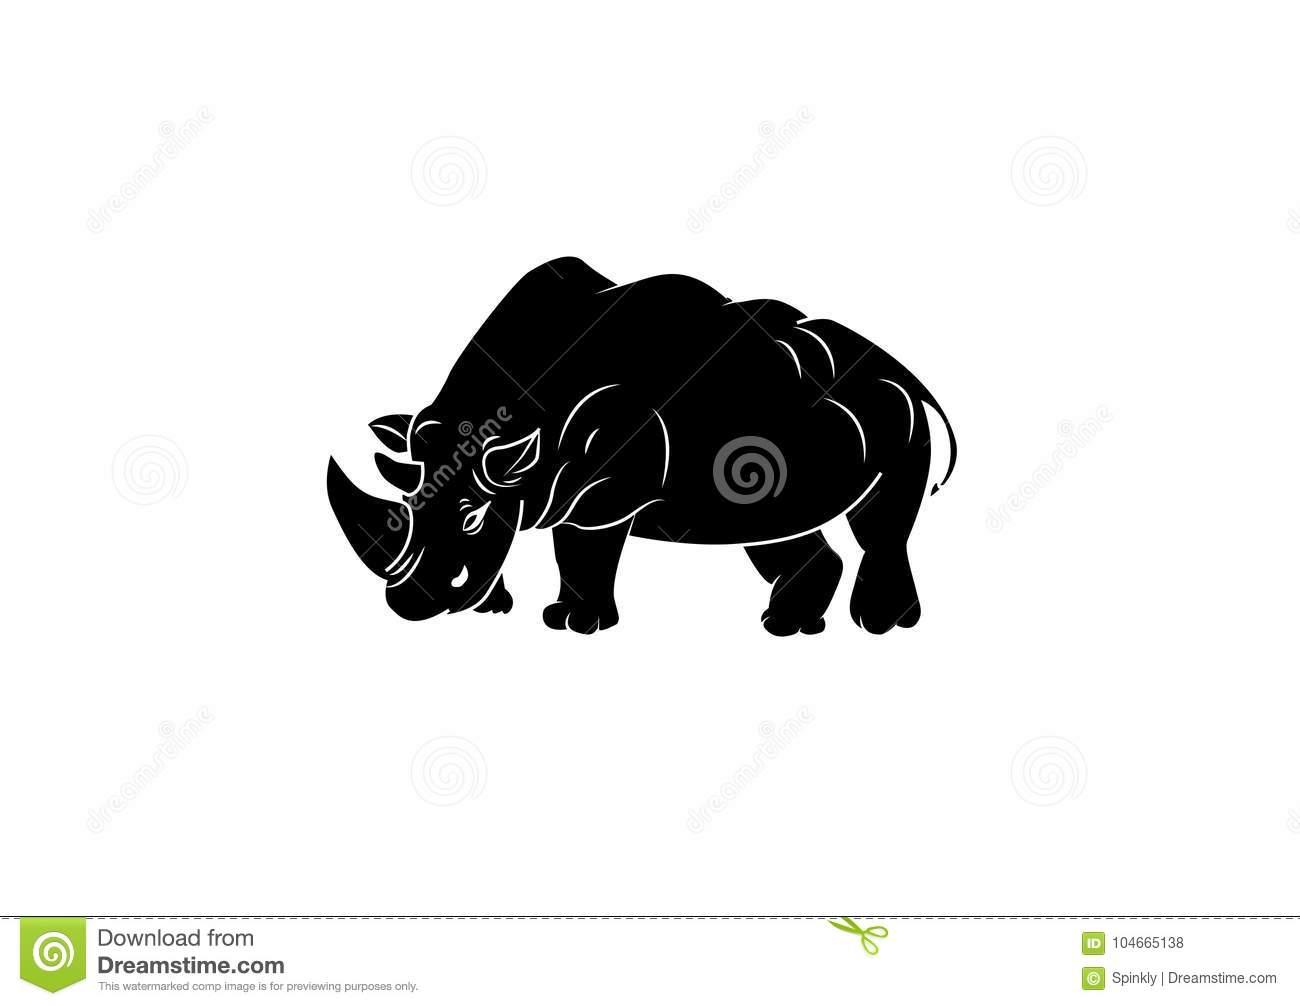 Rhino icon clipart stock illustration. Illustration of generated.